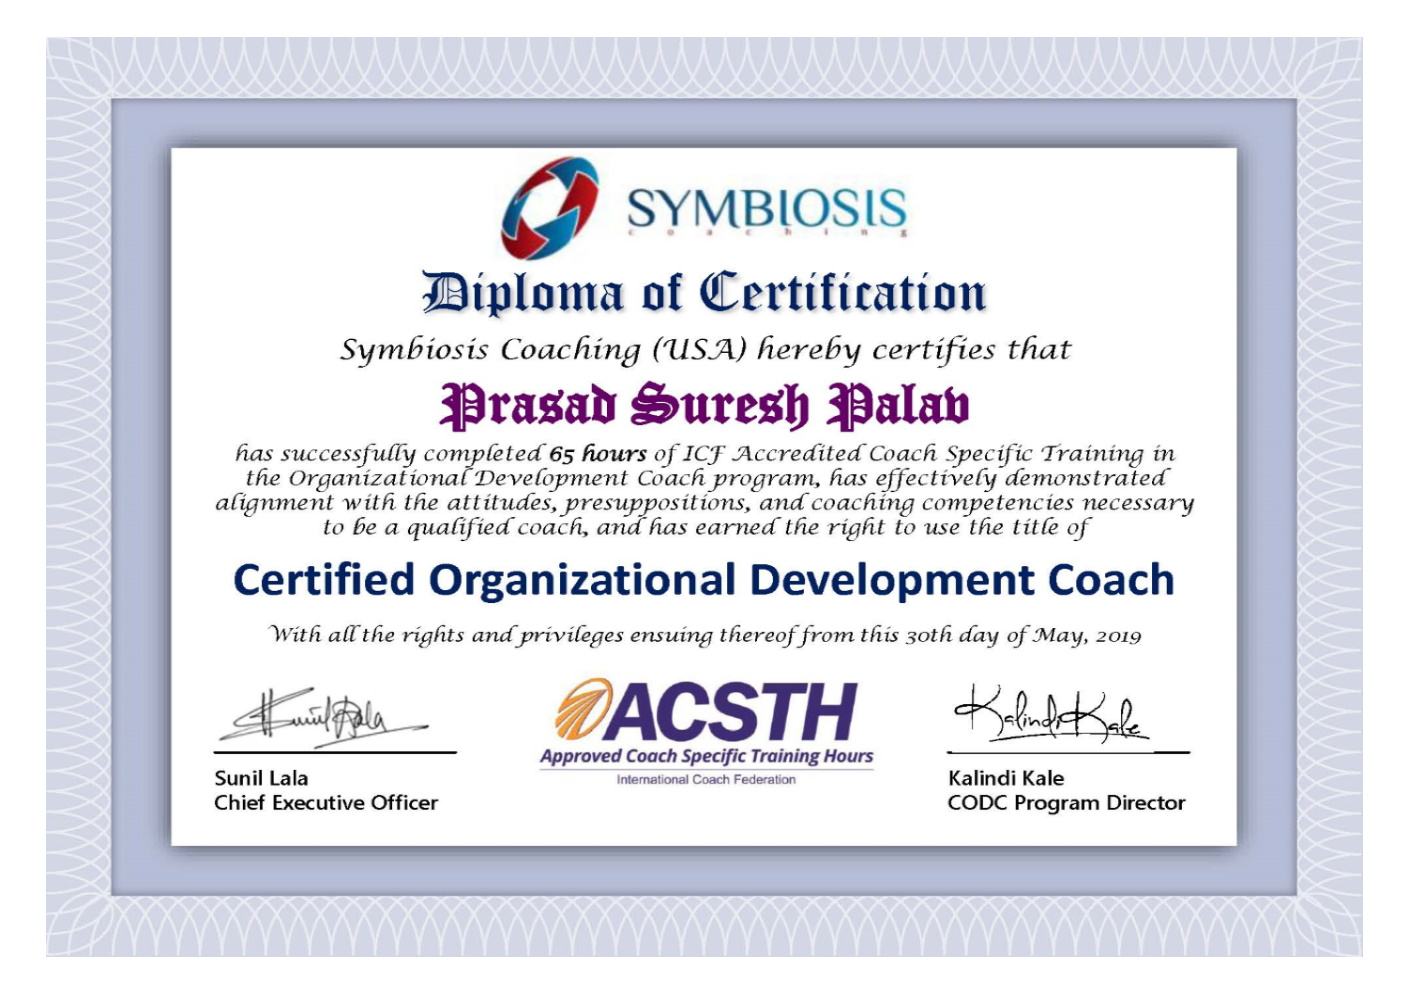 Prasad Palav – CODC Certificate